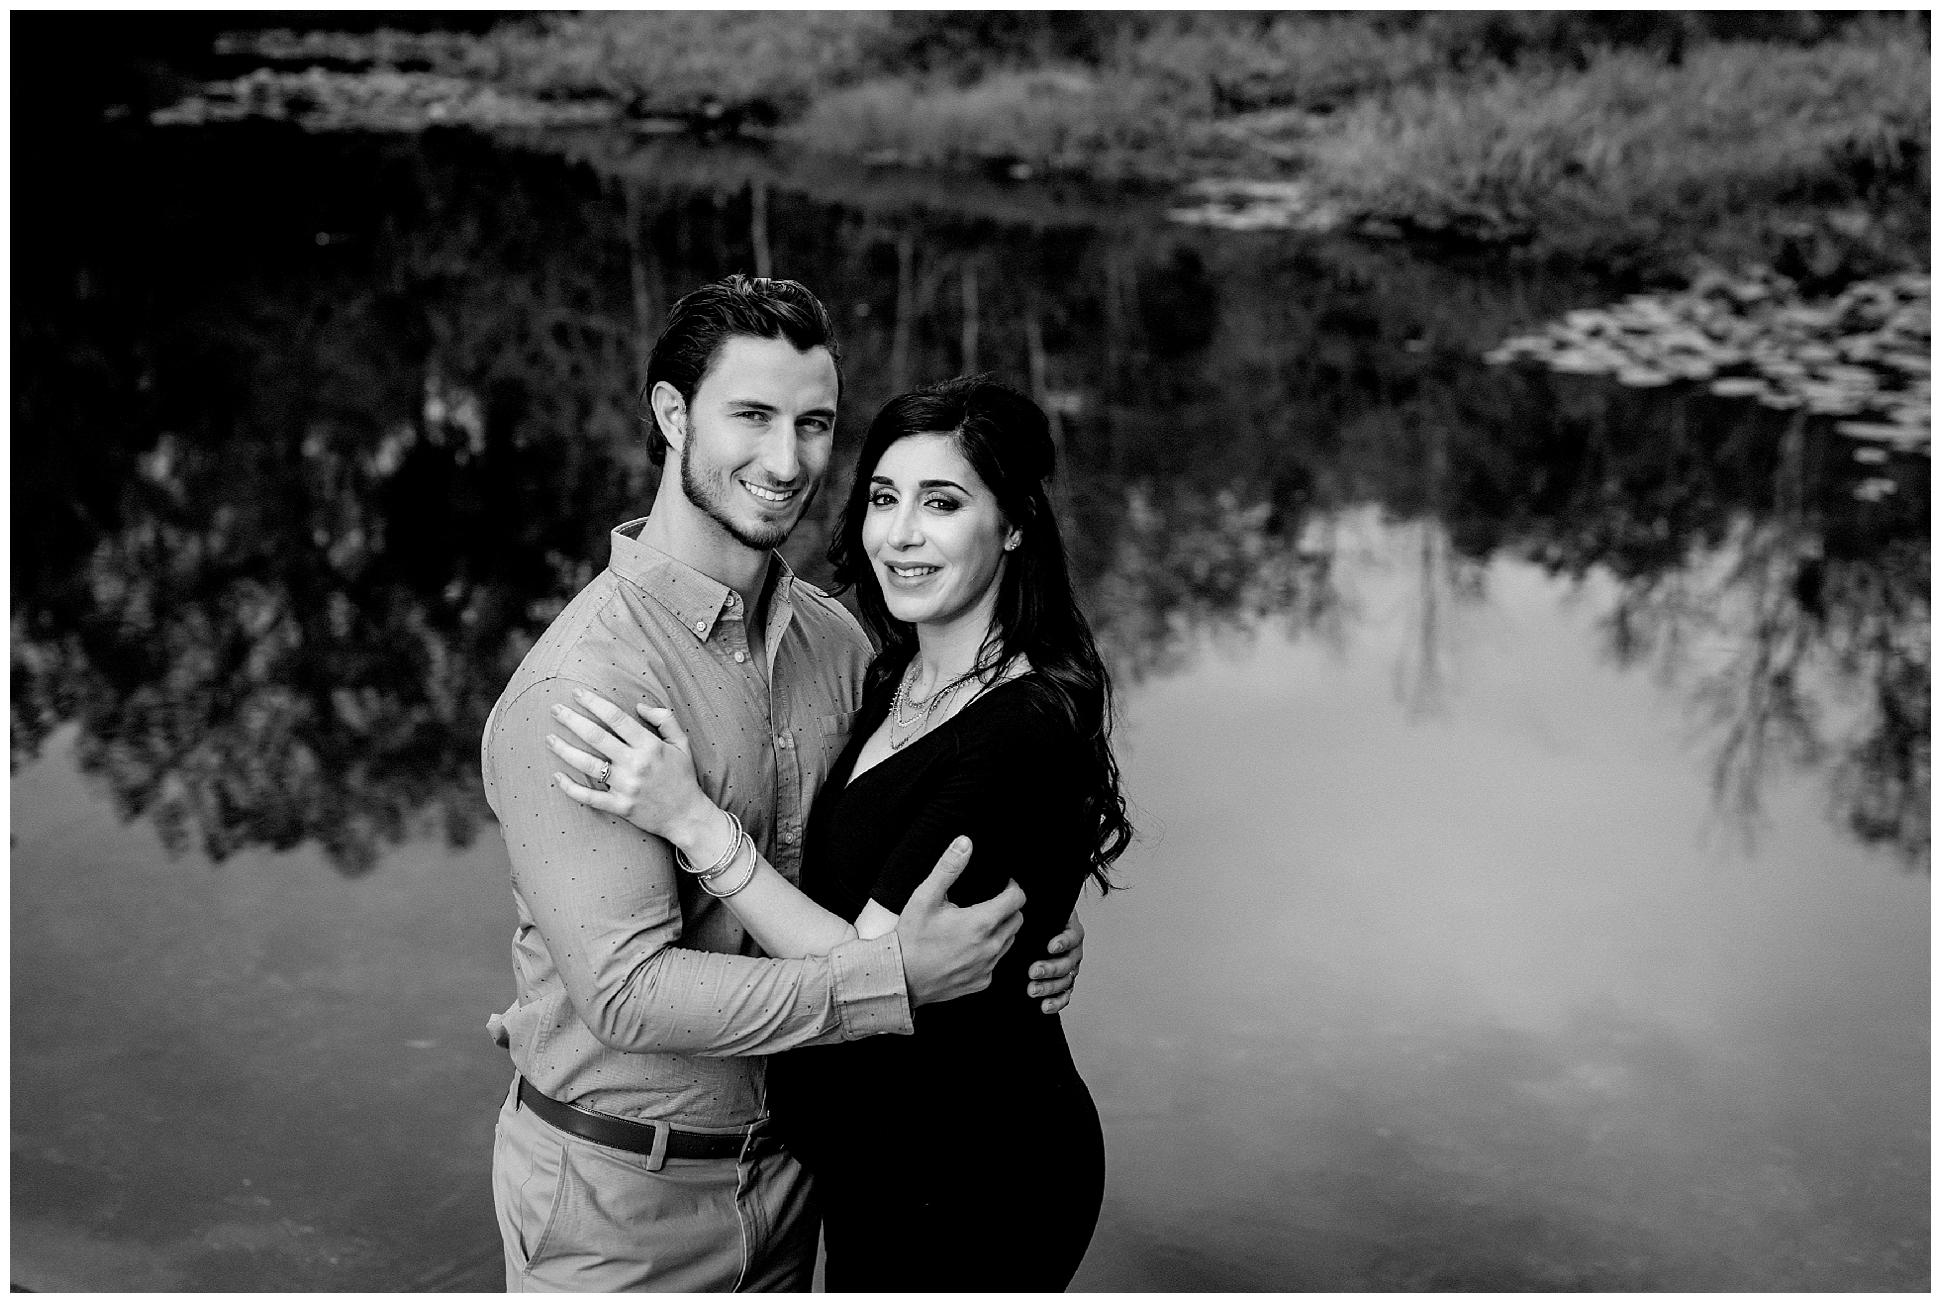 Tampa-maternity-photographer-morris-bridge-park-hip-tight-black-dress-woods_0005.jpg